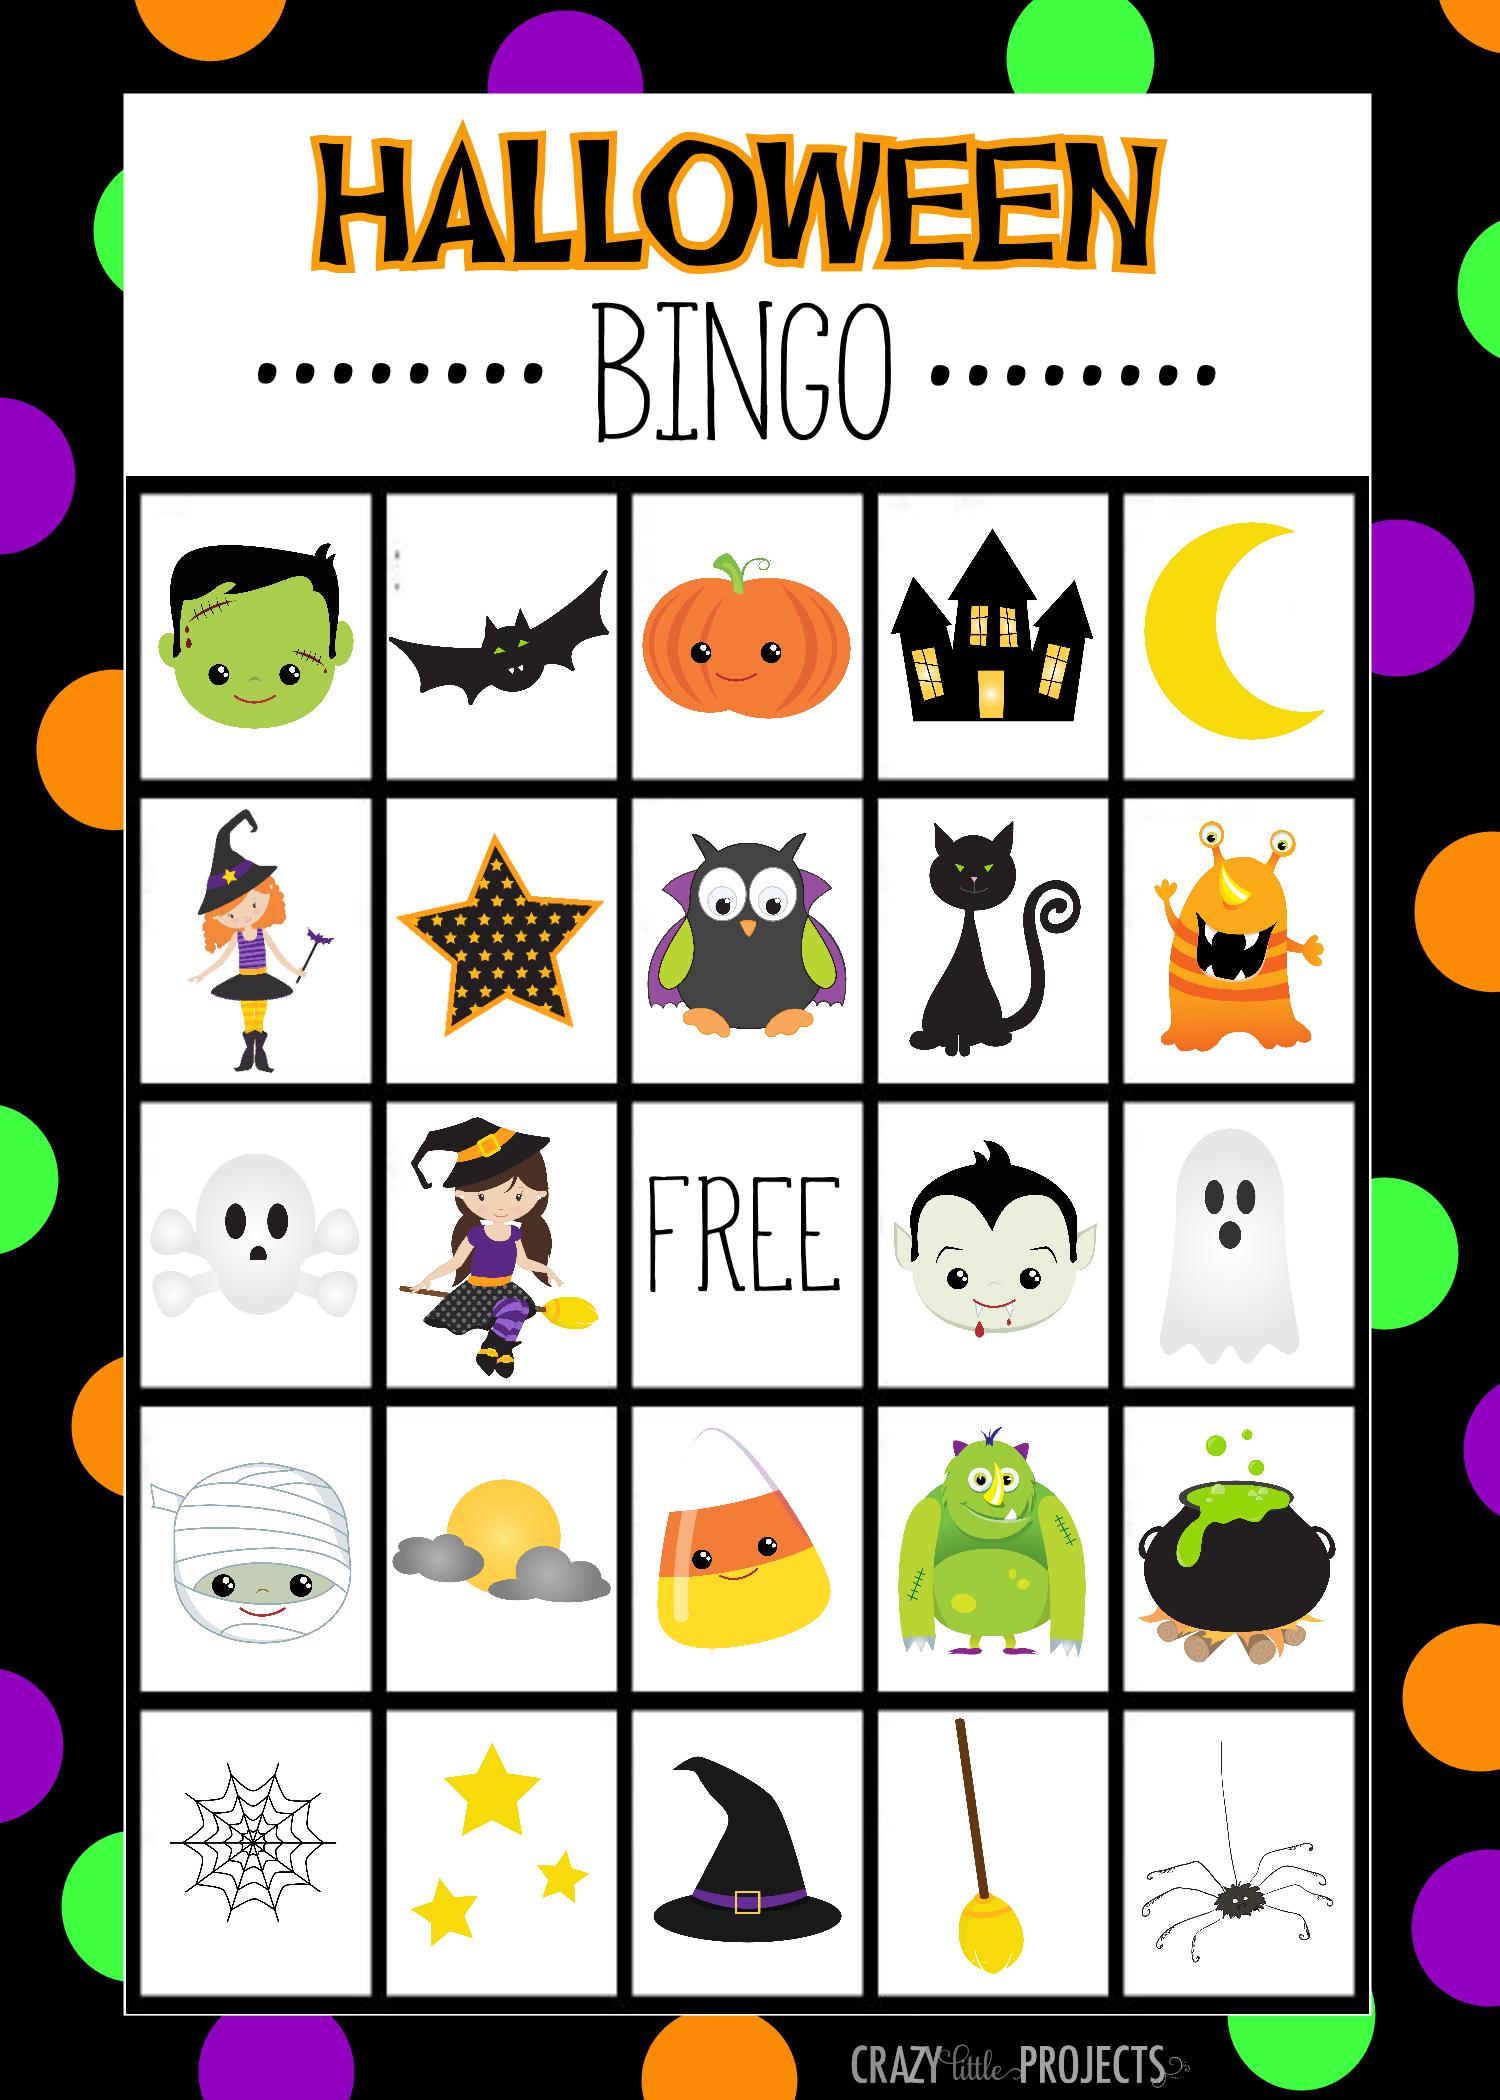 Halloween Bingo - Cute Free Printable Game | Halloween | Pinterest - Free Printable Halloween Party Games